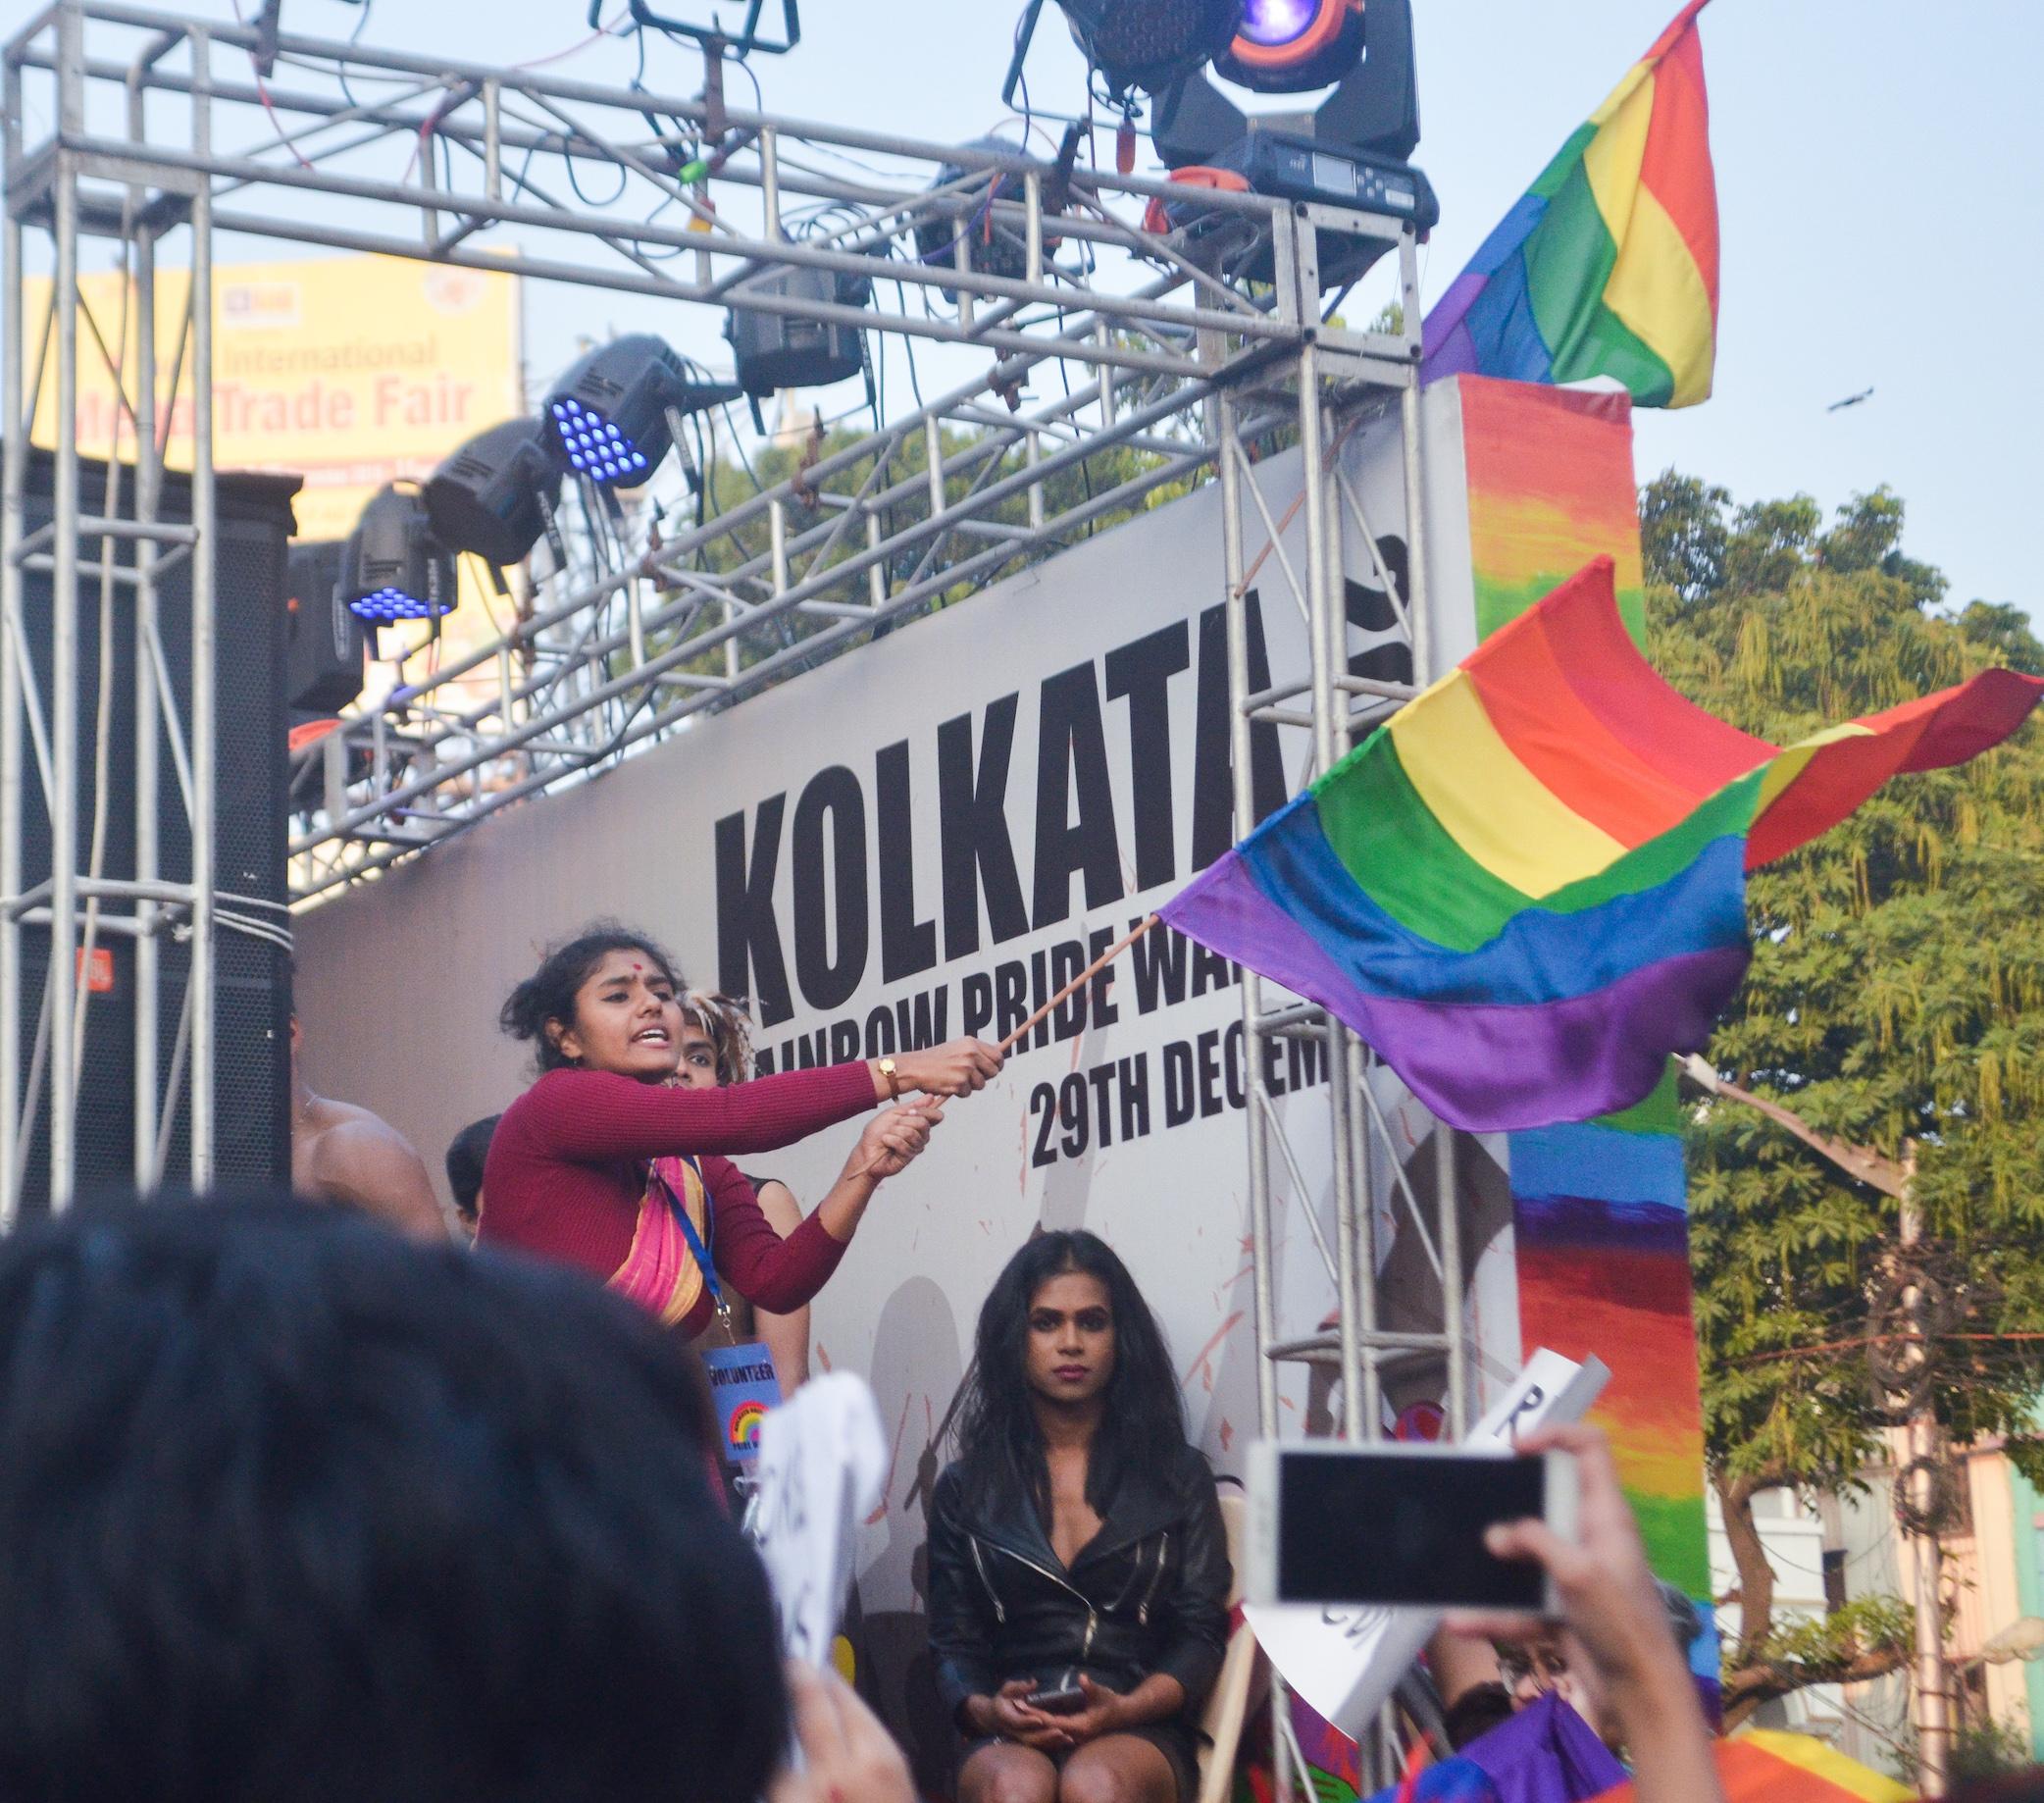 Kolkata Pride 2019: Rainbow Over The City Of Joy